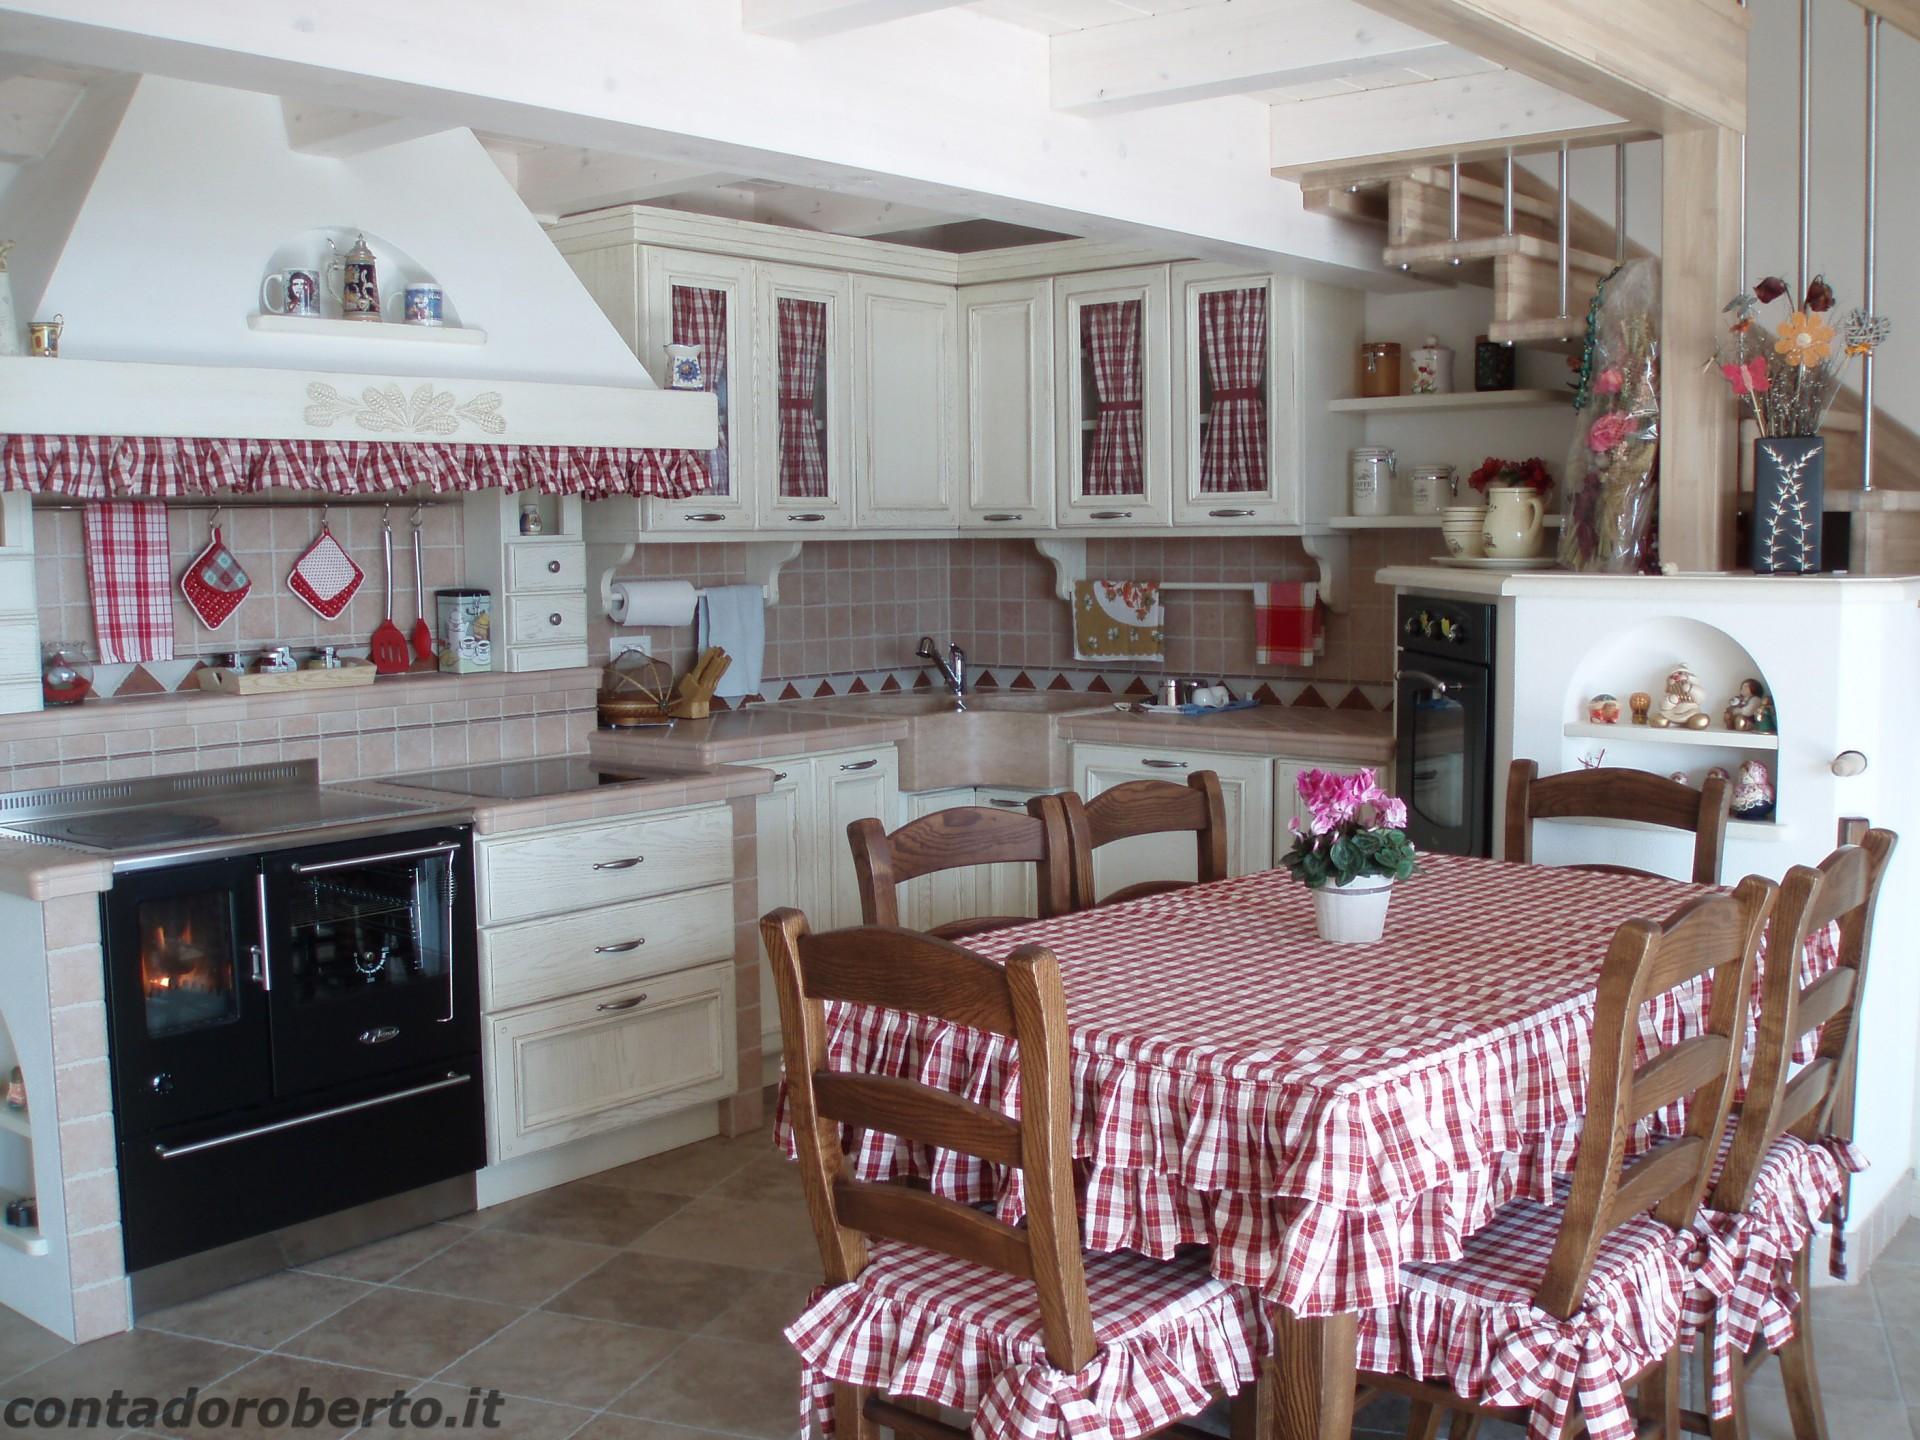 Cucina in muratura sotto soppalco contado roberto group - Cucine a muratura moderne ...